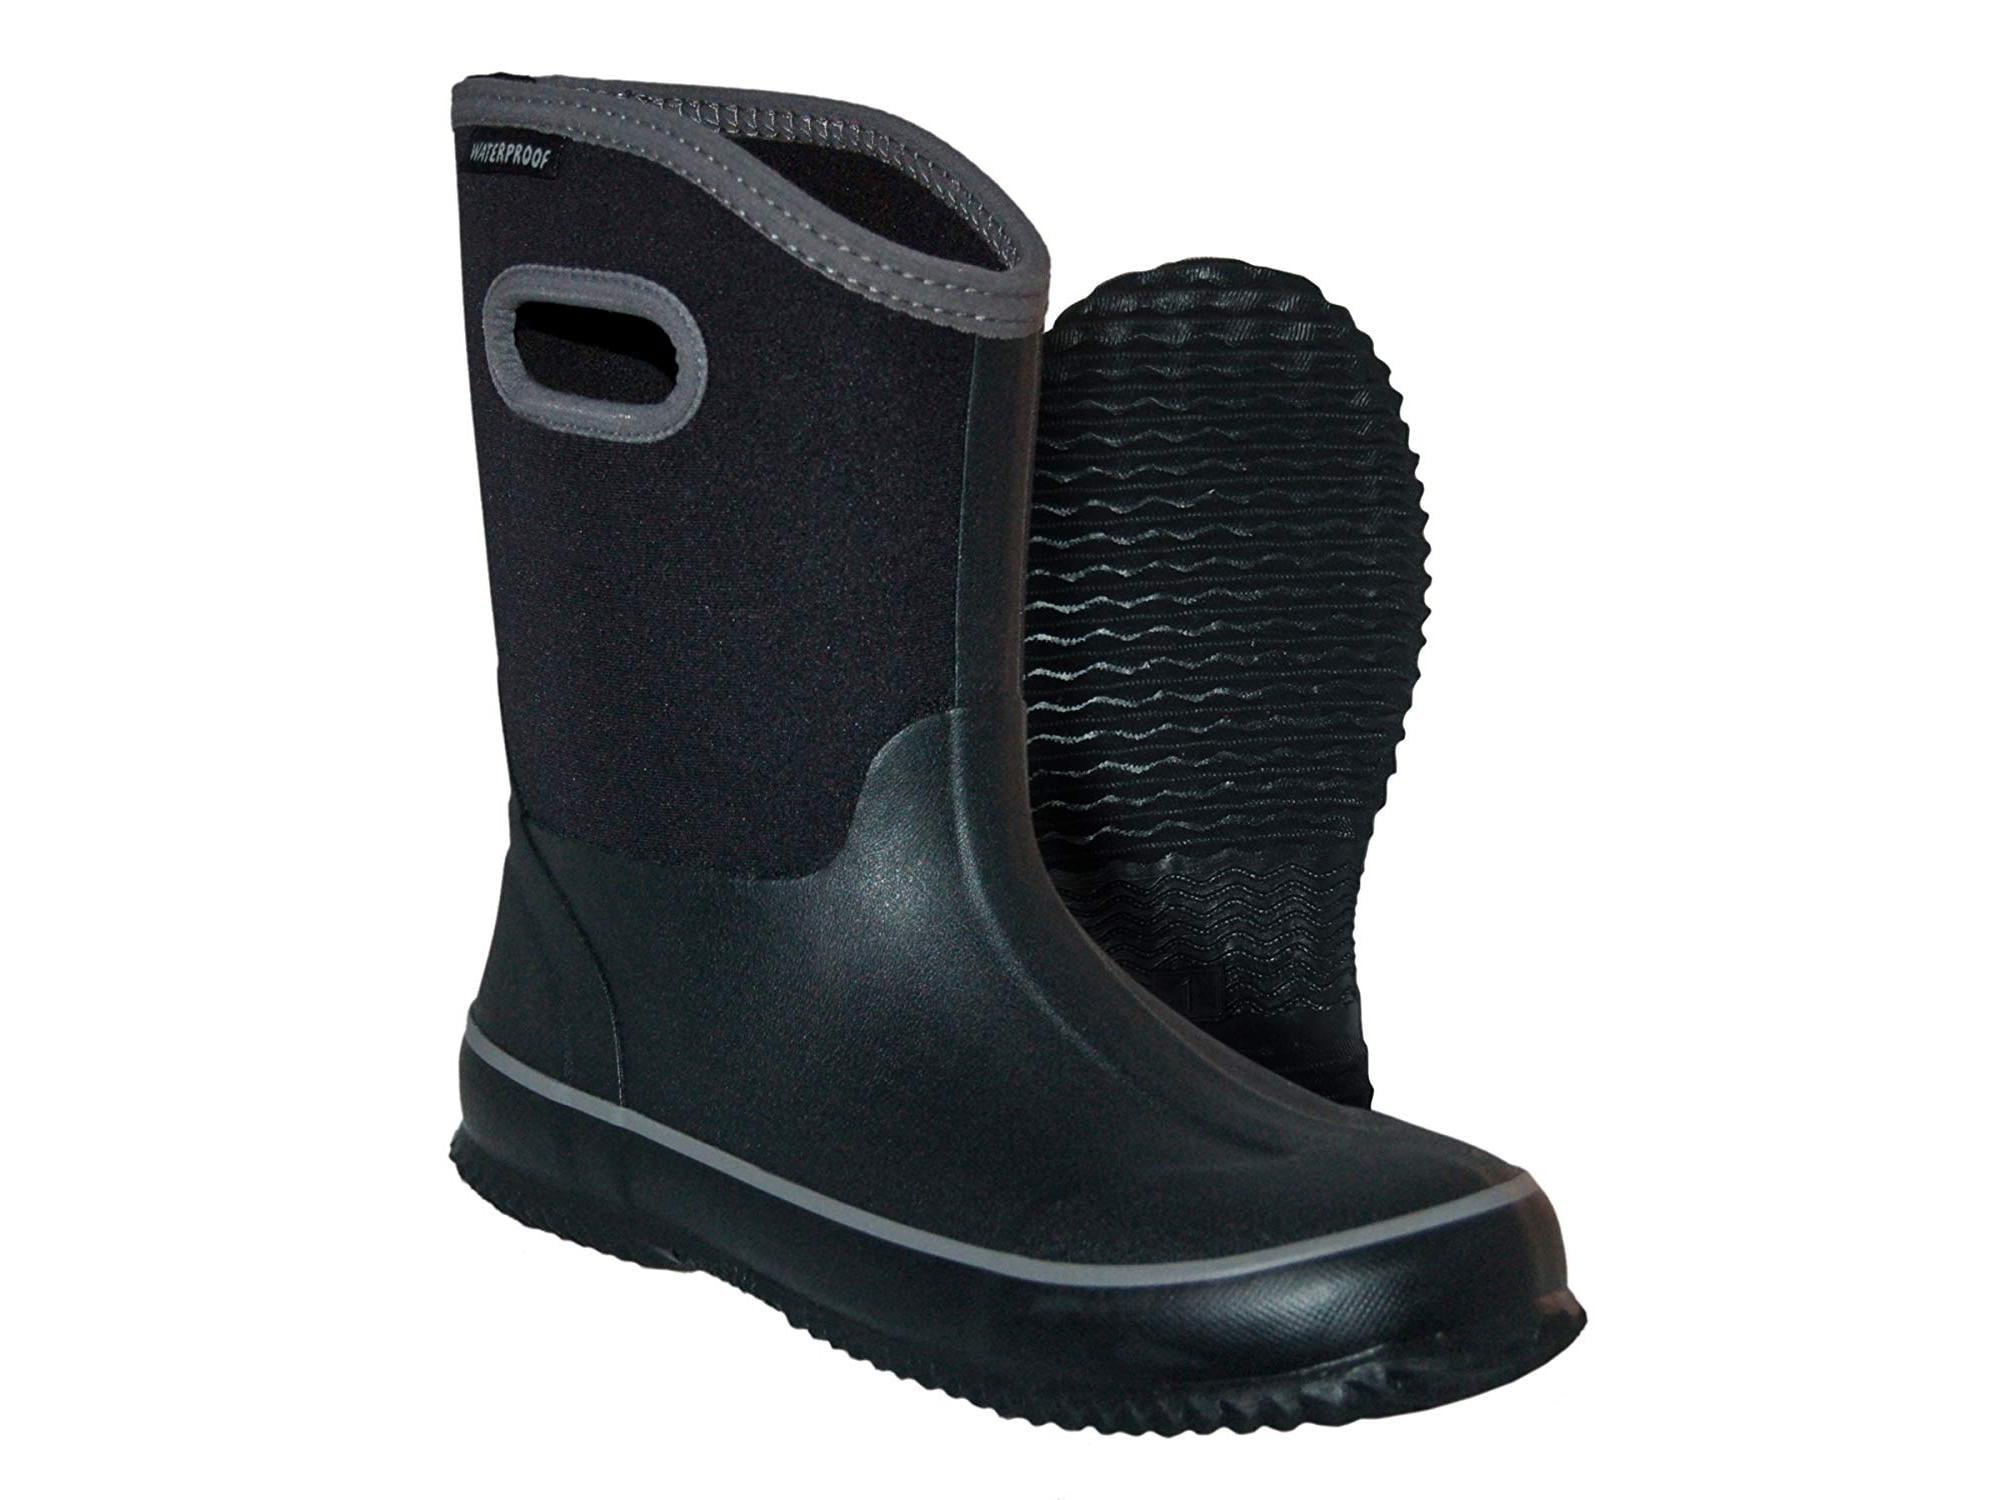 Itasca Kids' Youth Bayou Rubber Neoprene Waterproof Rain Boot by Itasca